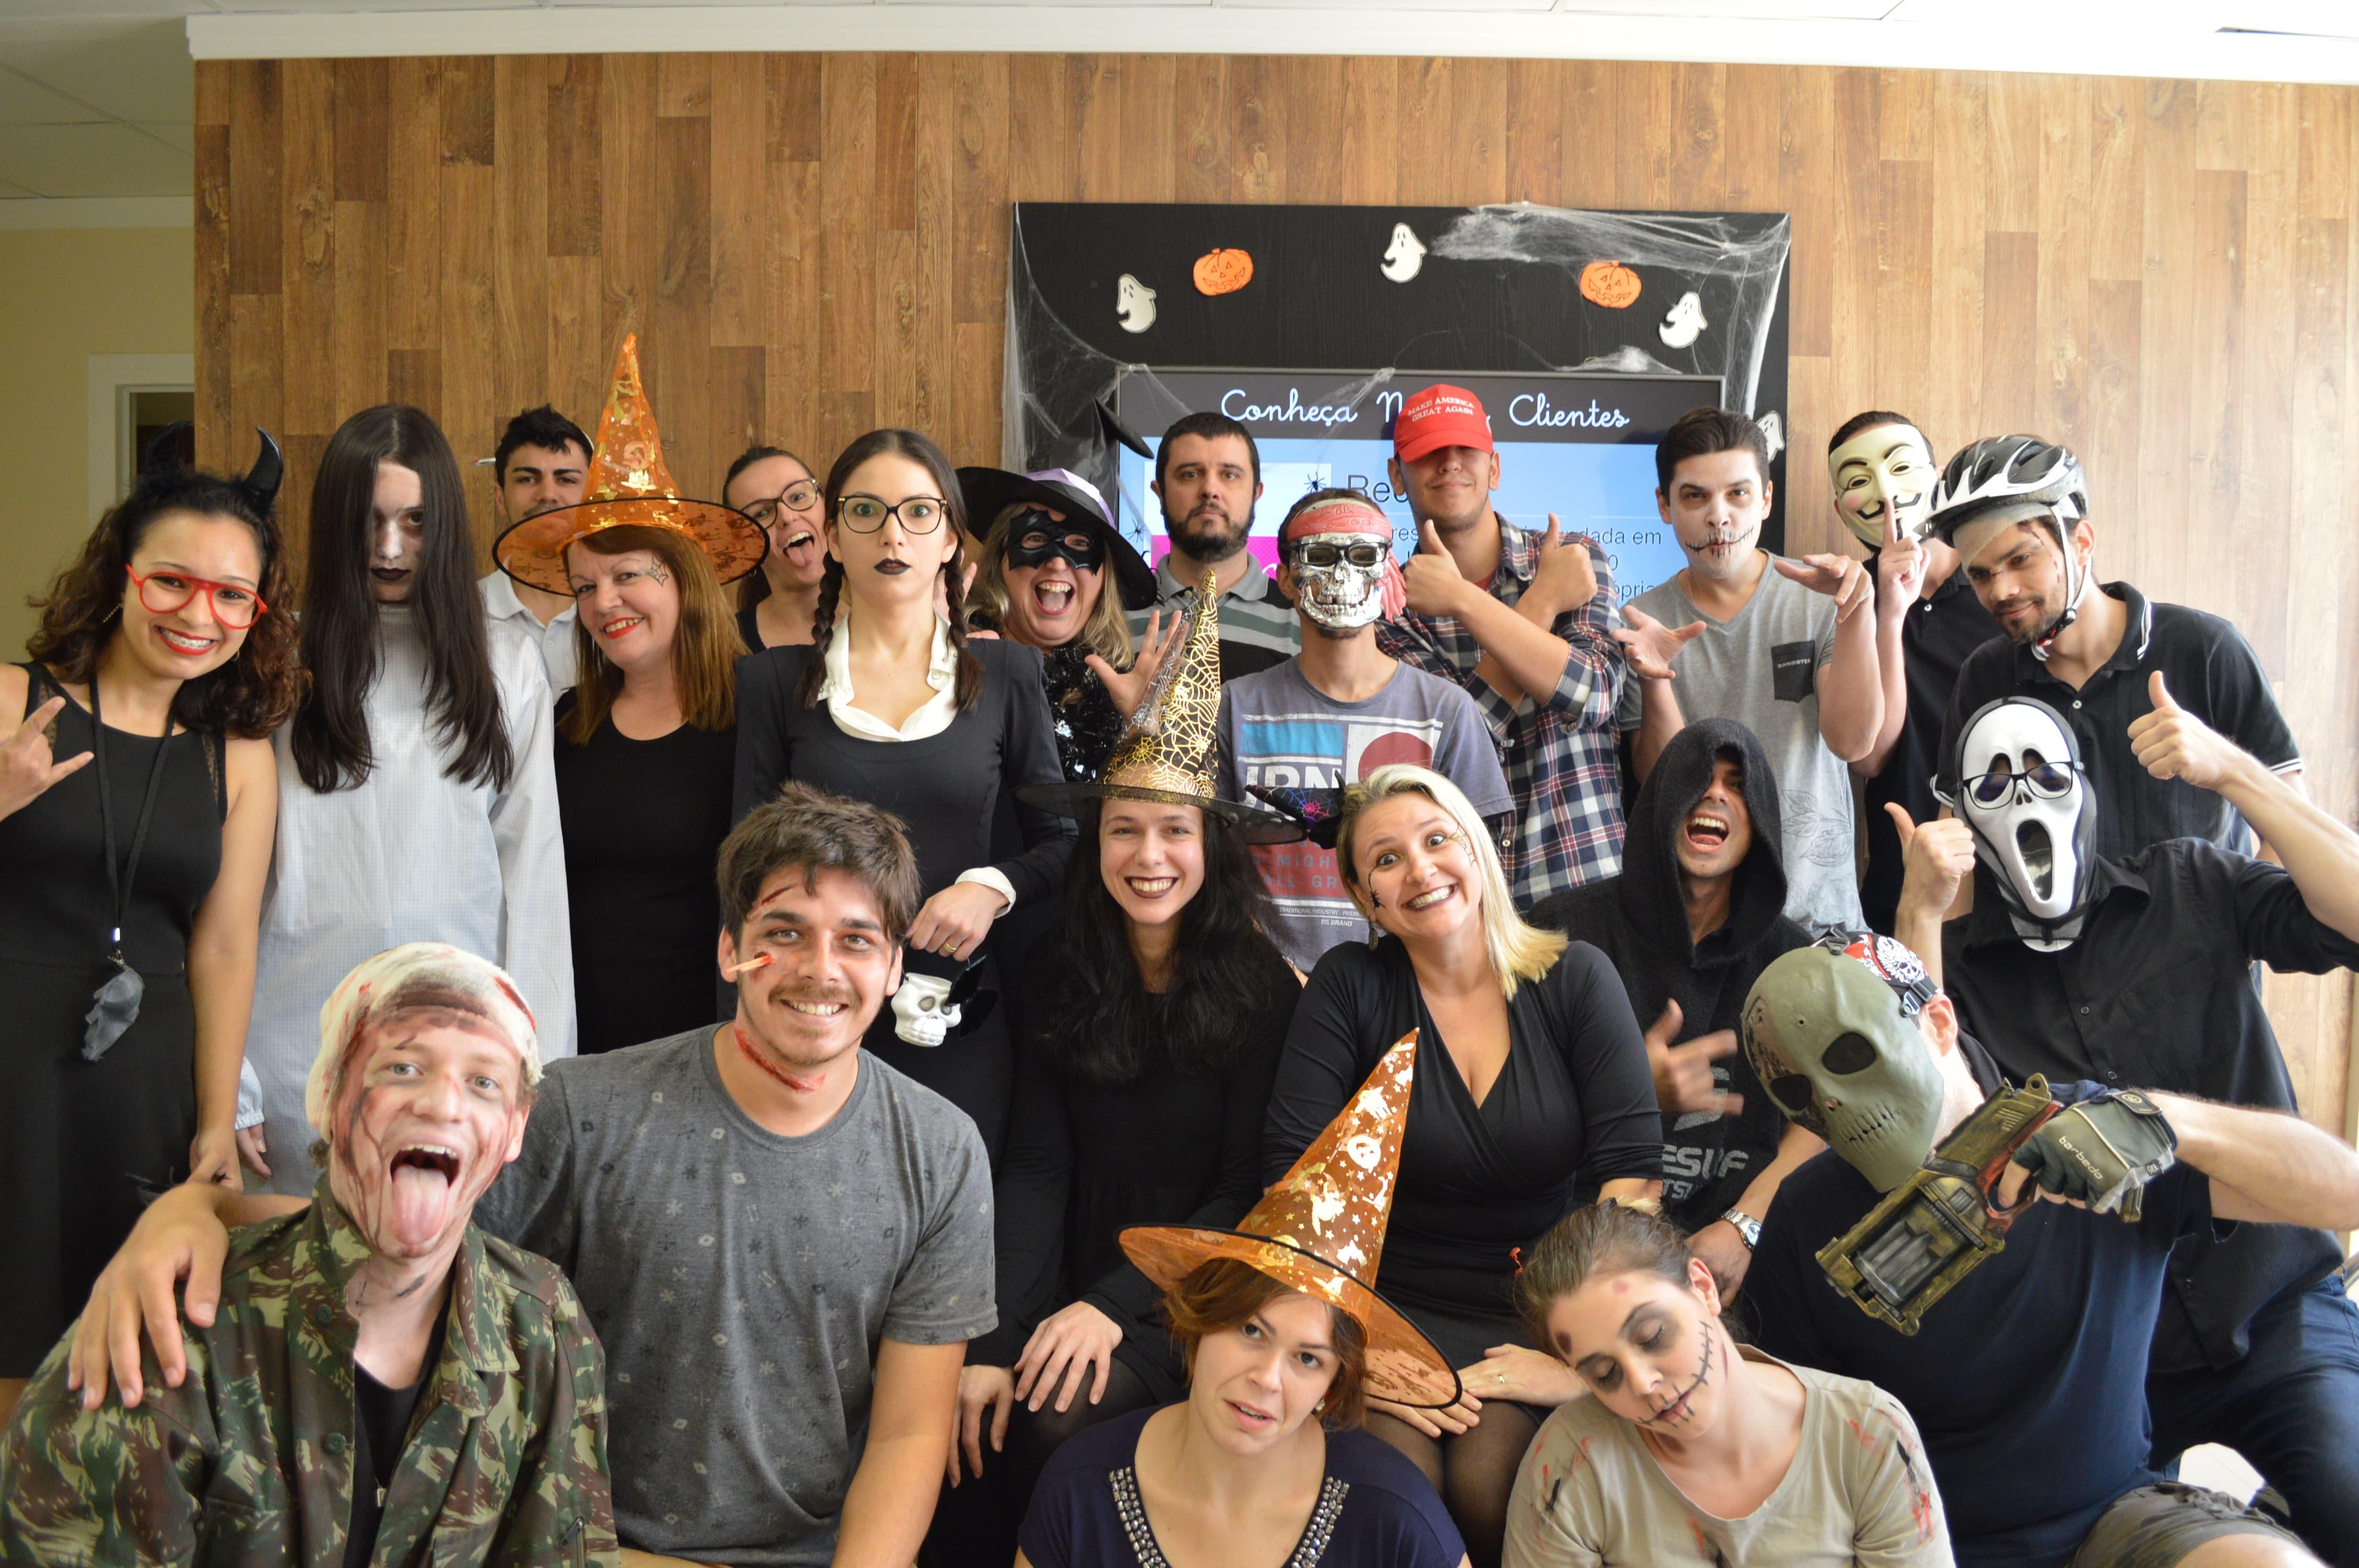 Halloween nas Empresas - 10 Ideias de Endomarketing